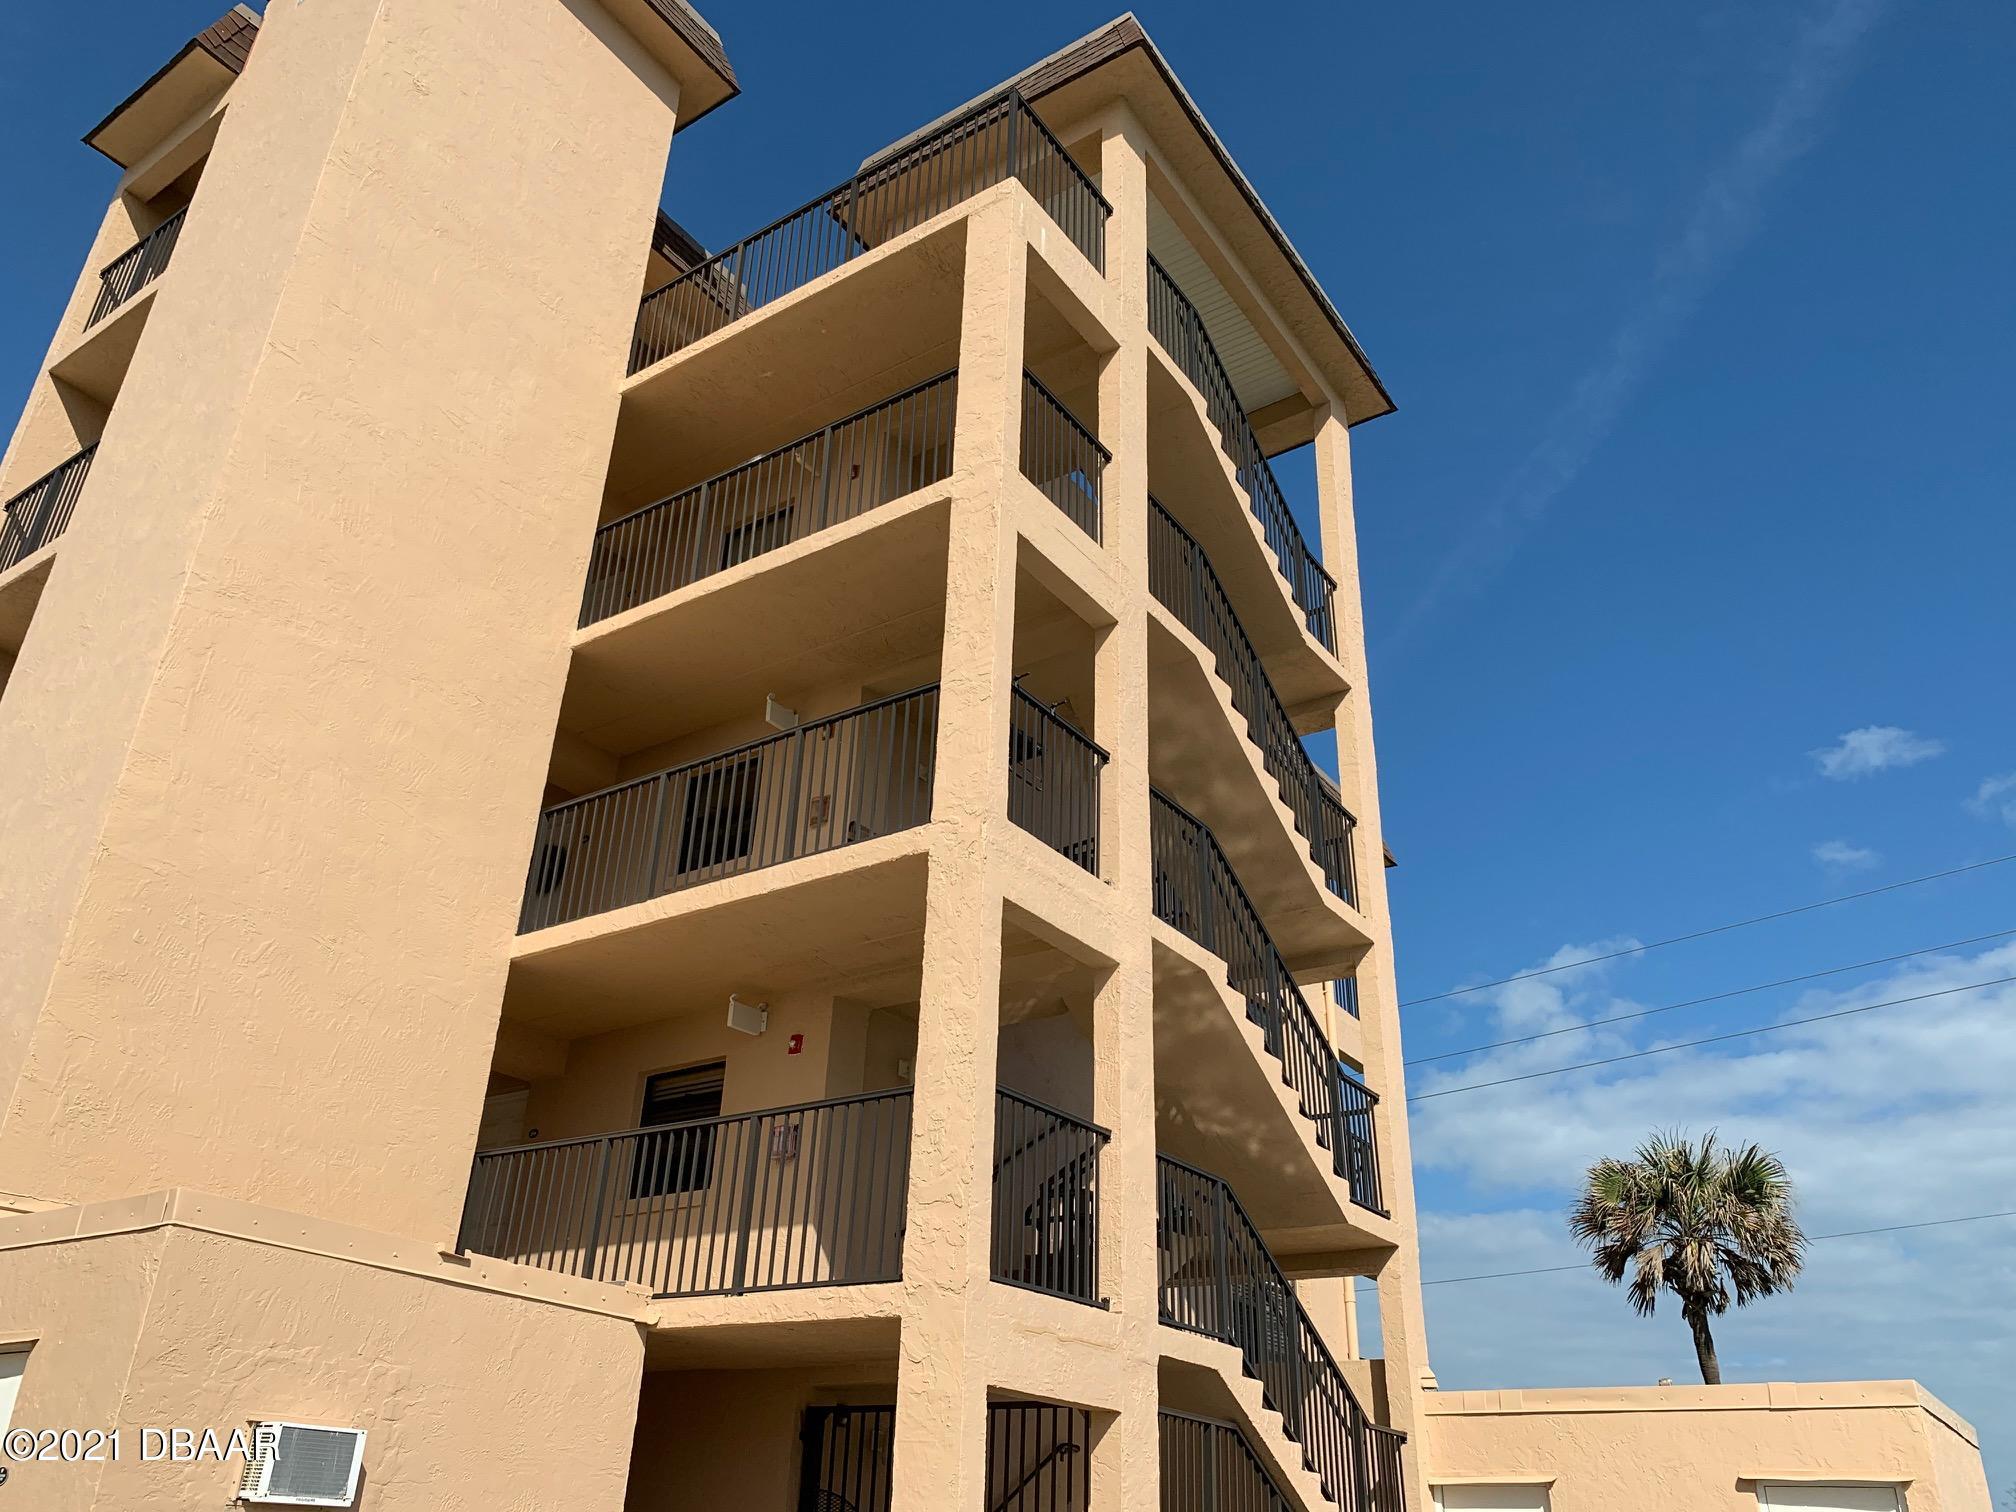 Details for 2390 Ocean Shore Boulevard 3050, Ormond Beach, FL 32176